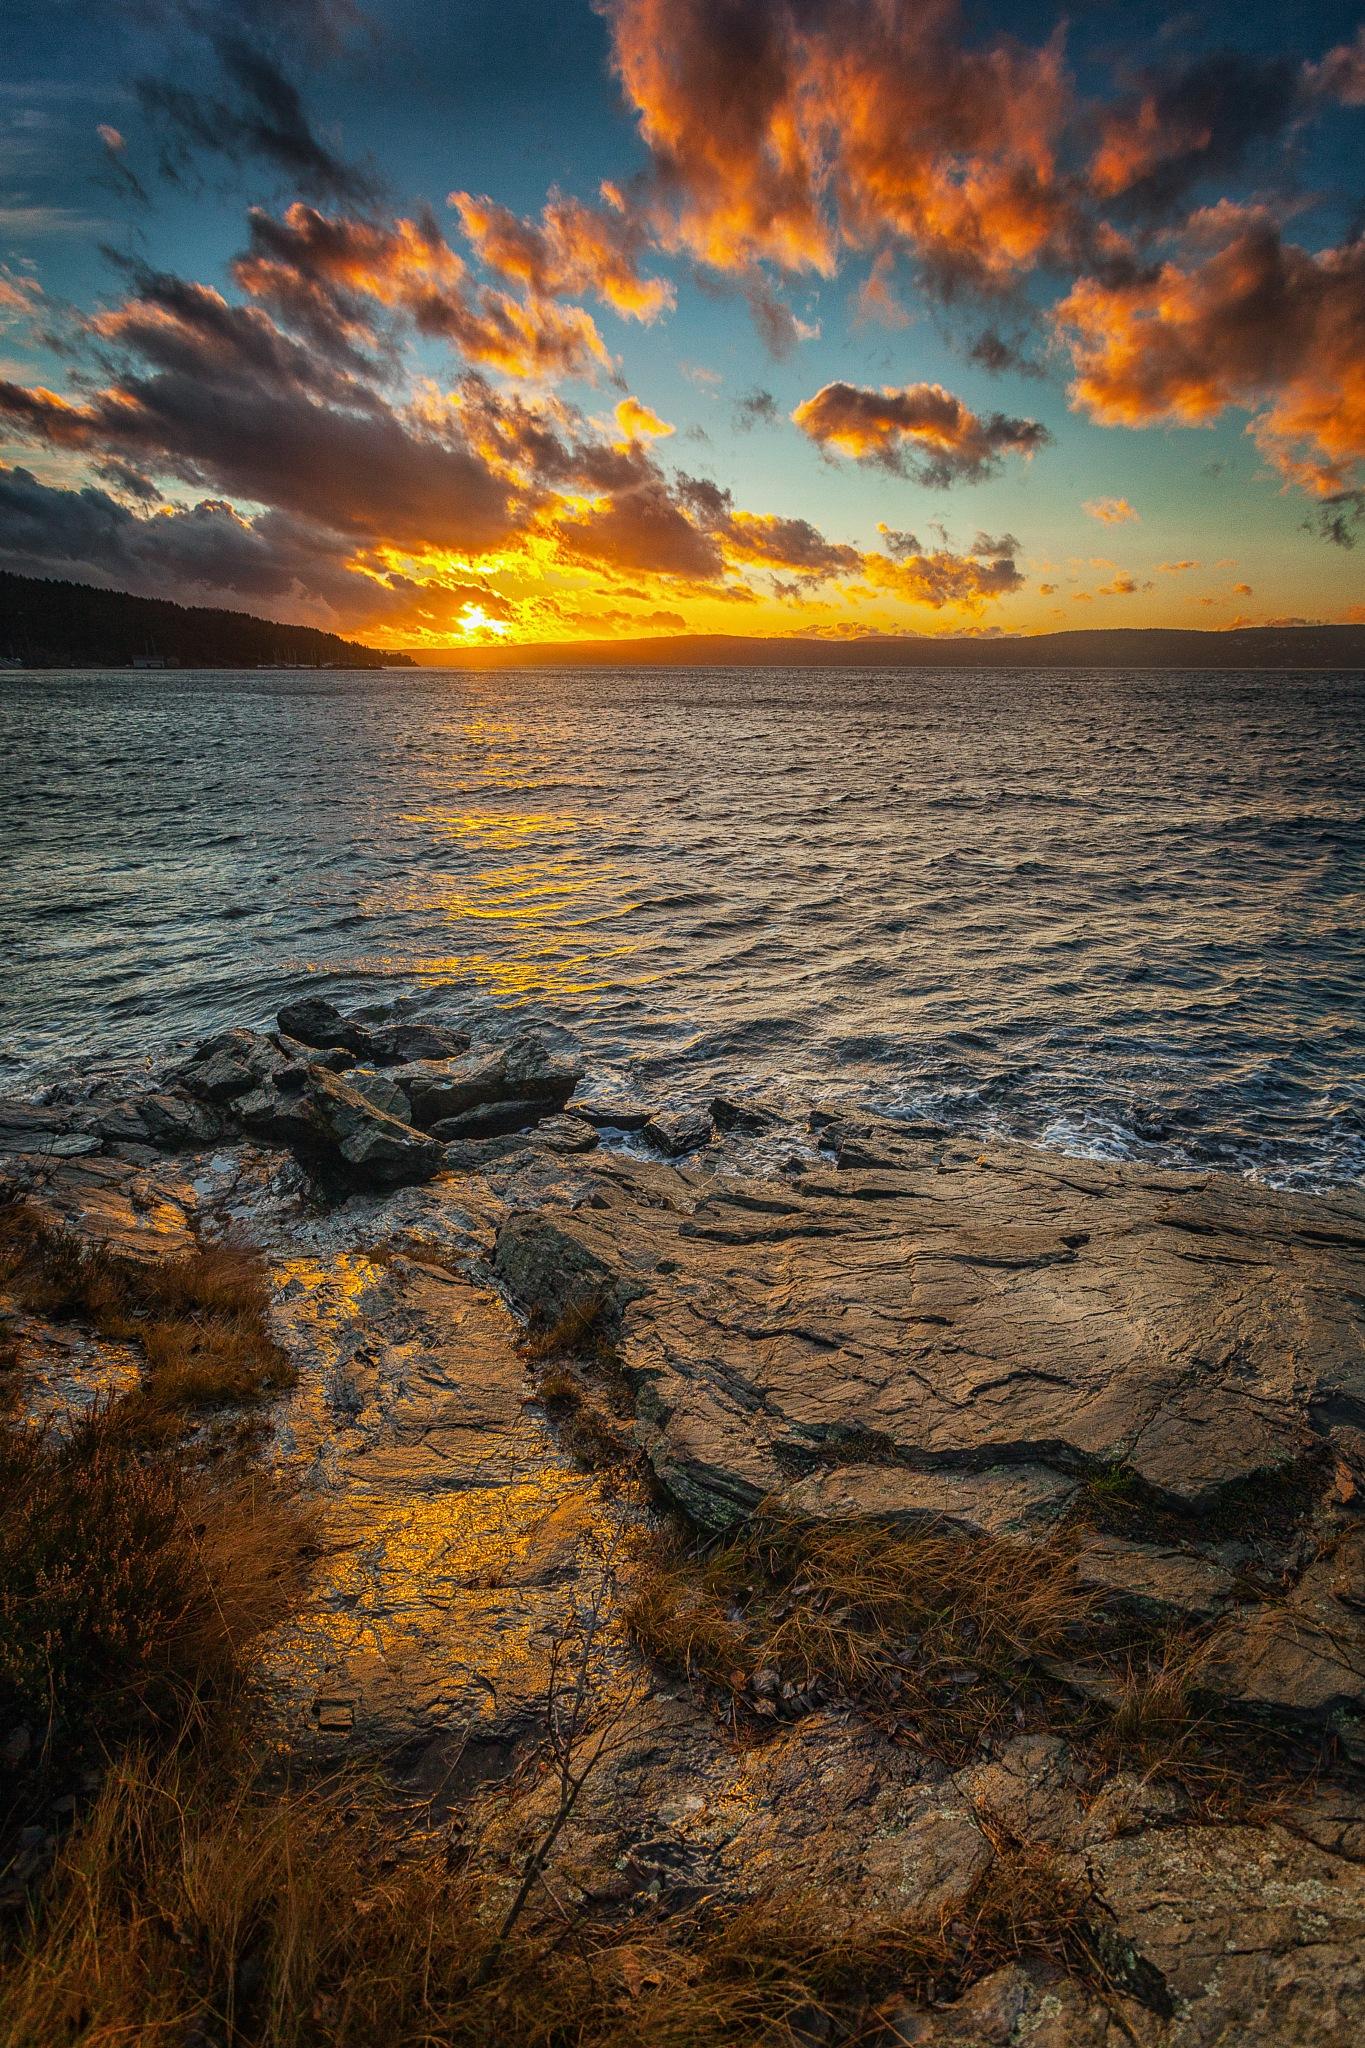 Sunset at the Oslofjord by Benjamin Zocholl